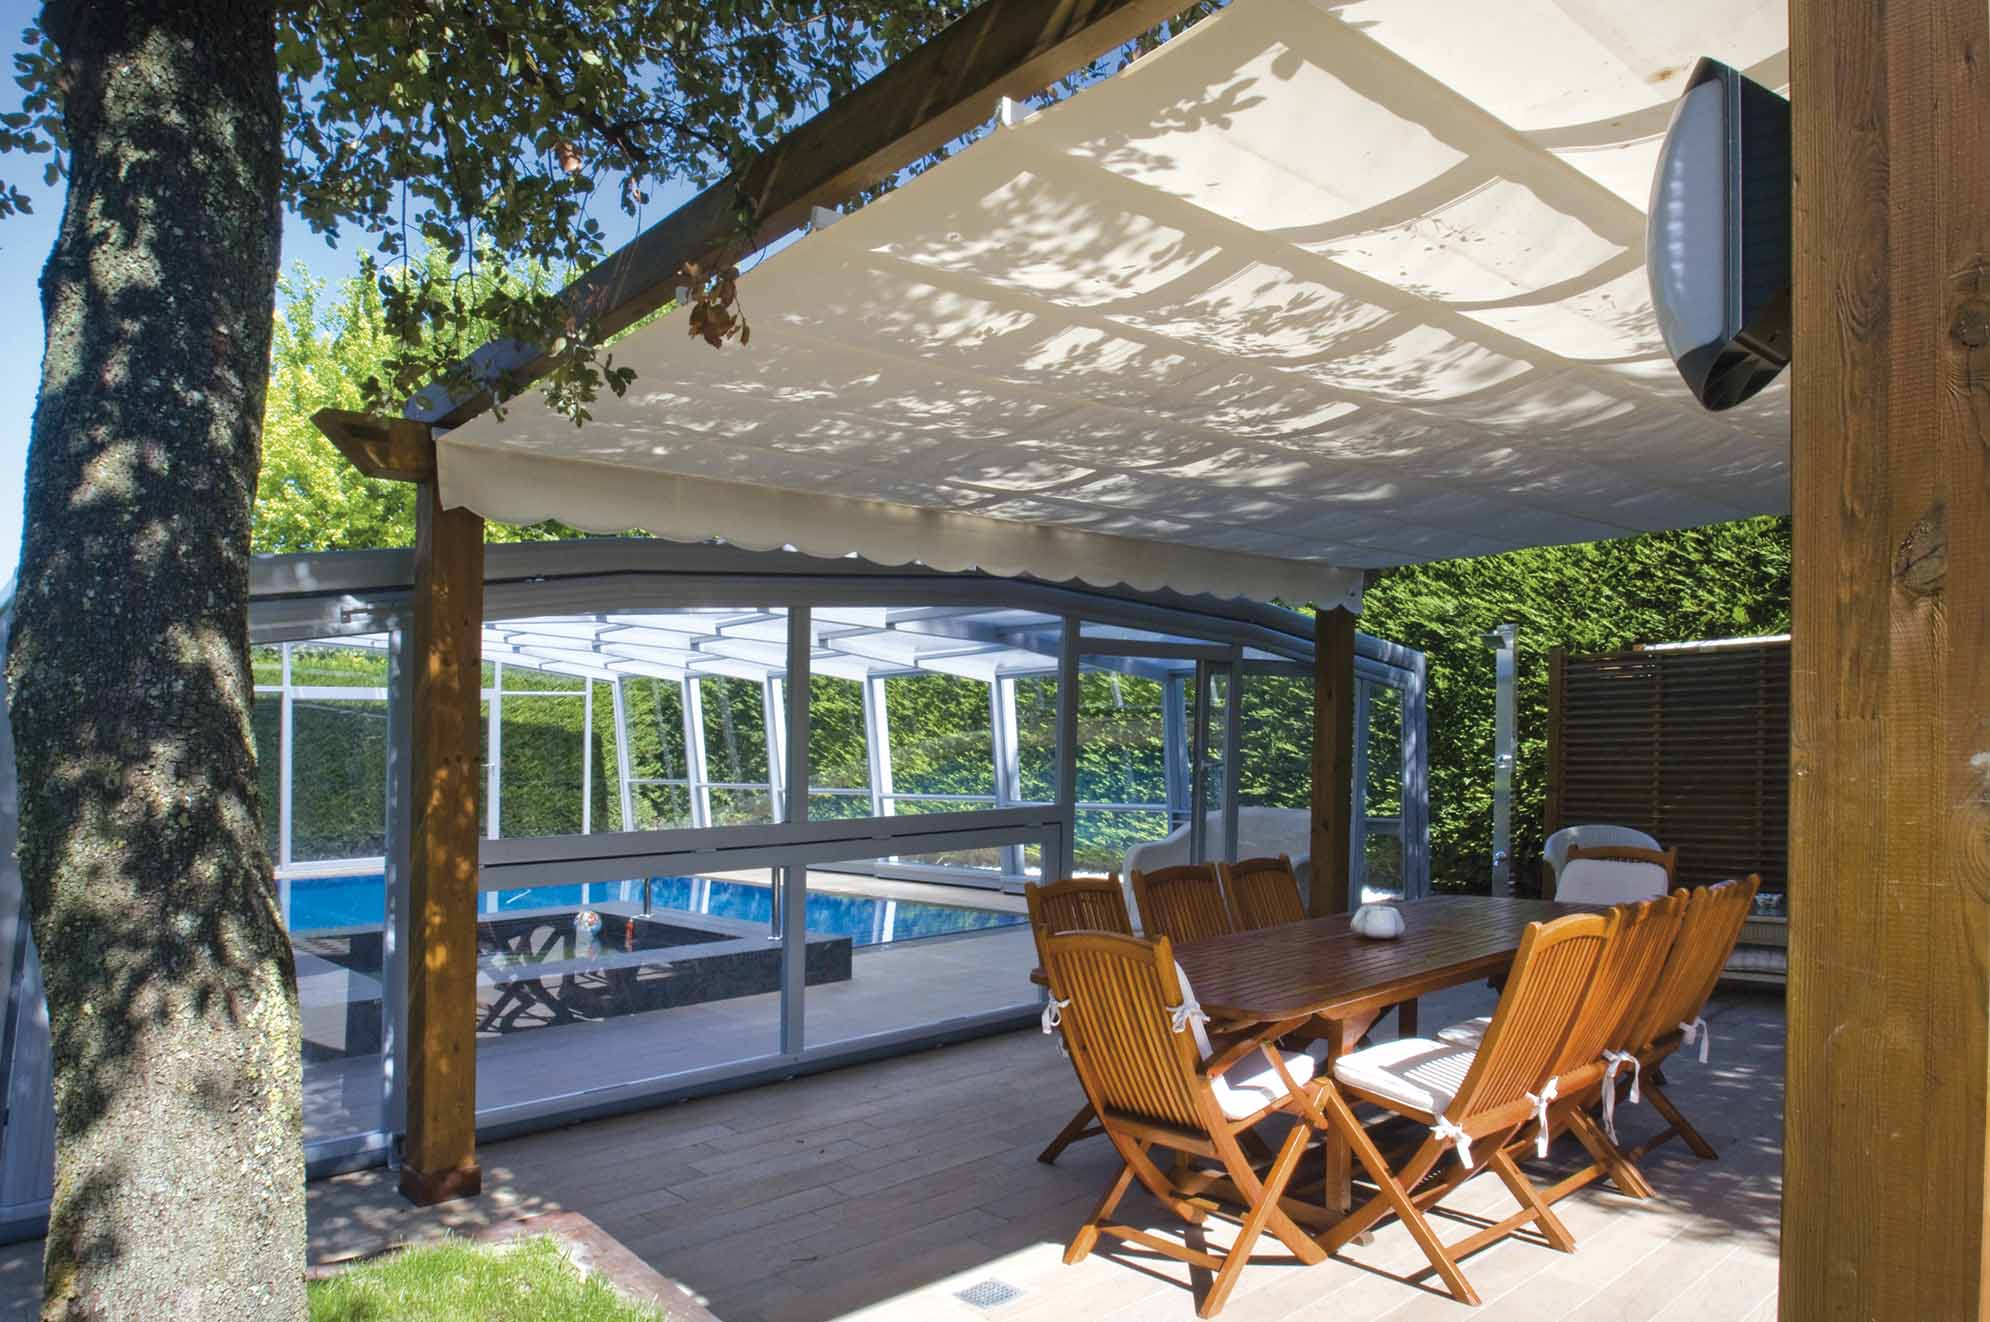 toldos-porche-jardin-exterior-6